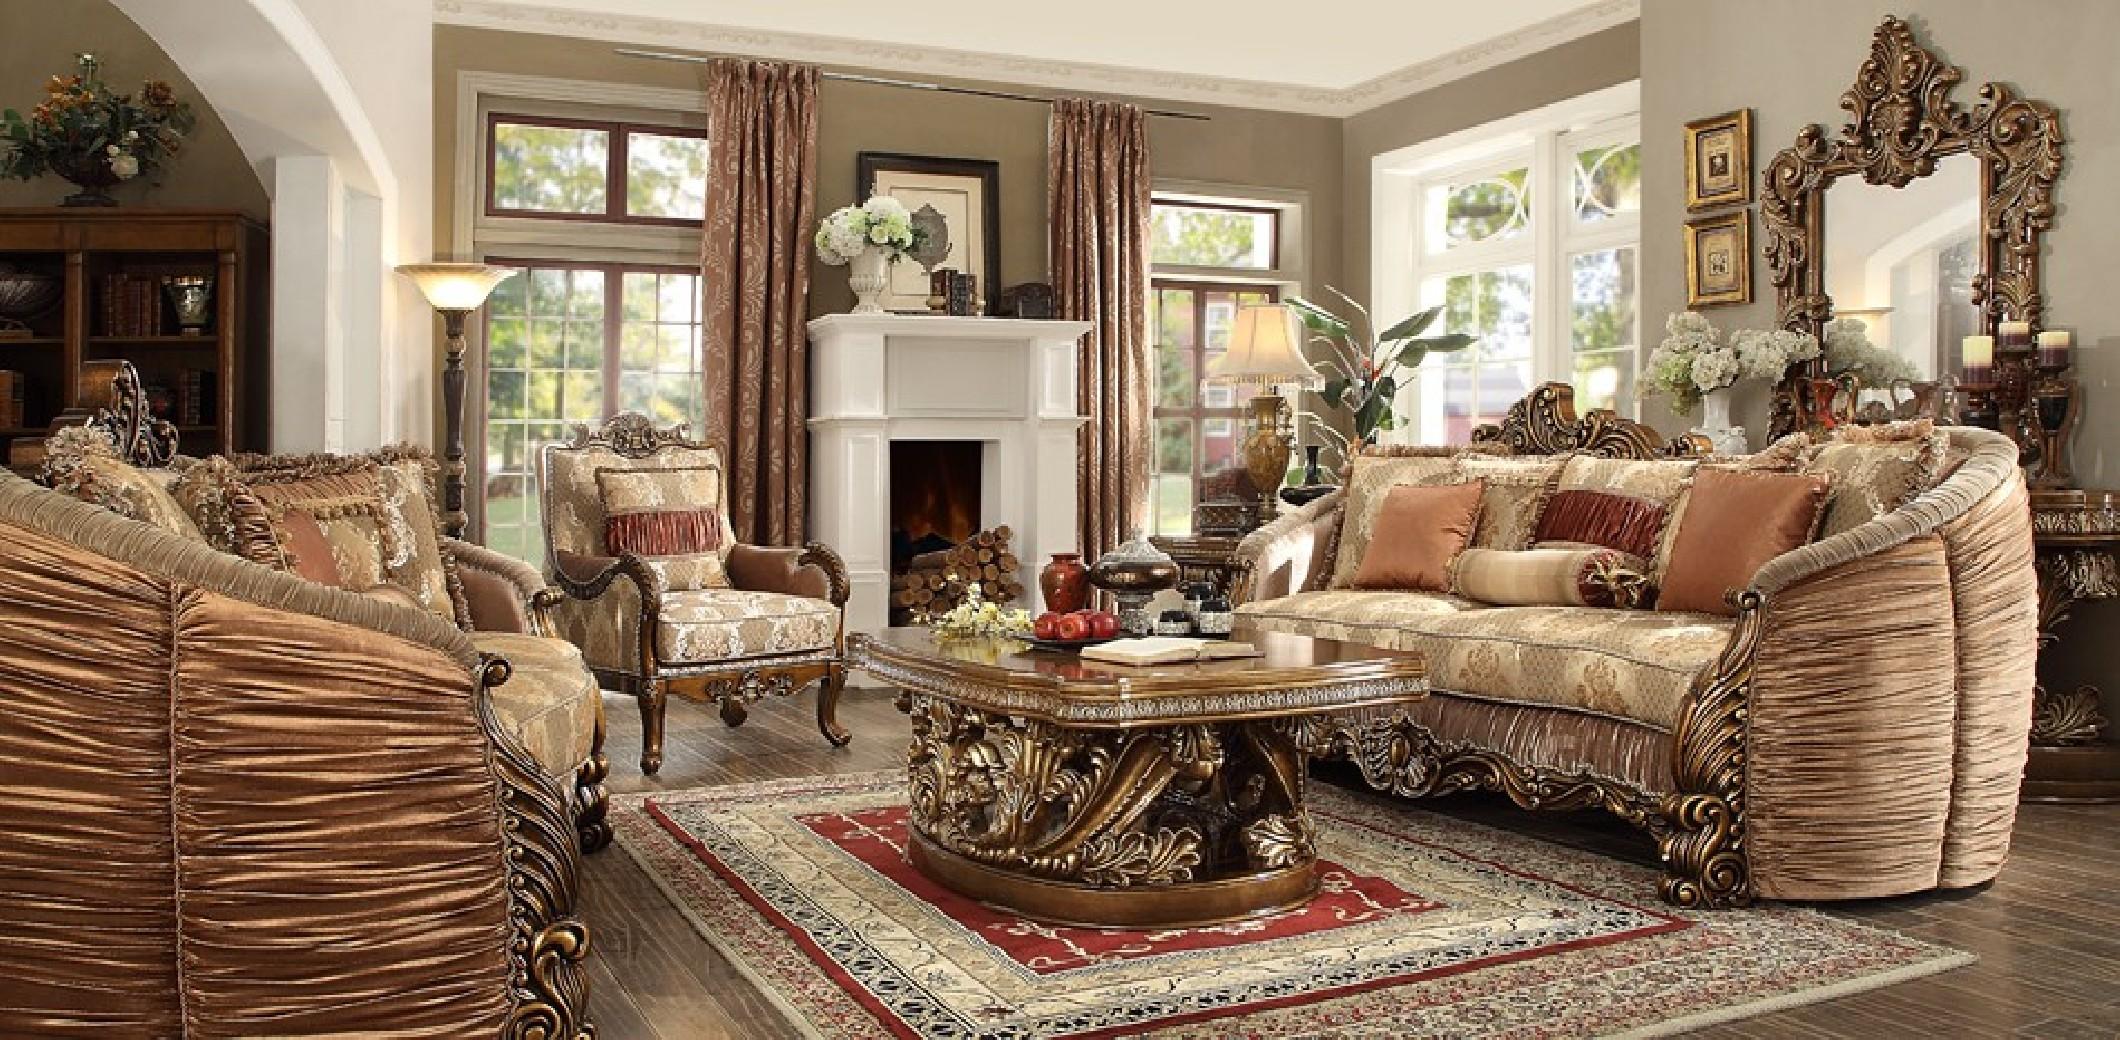 hd 1601 homey design upholstery living room set victorian european classic design sofa set. Black Bedroom Furniture Sets. Home Design Ideas